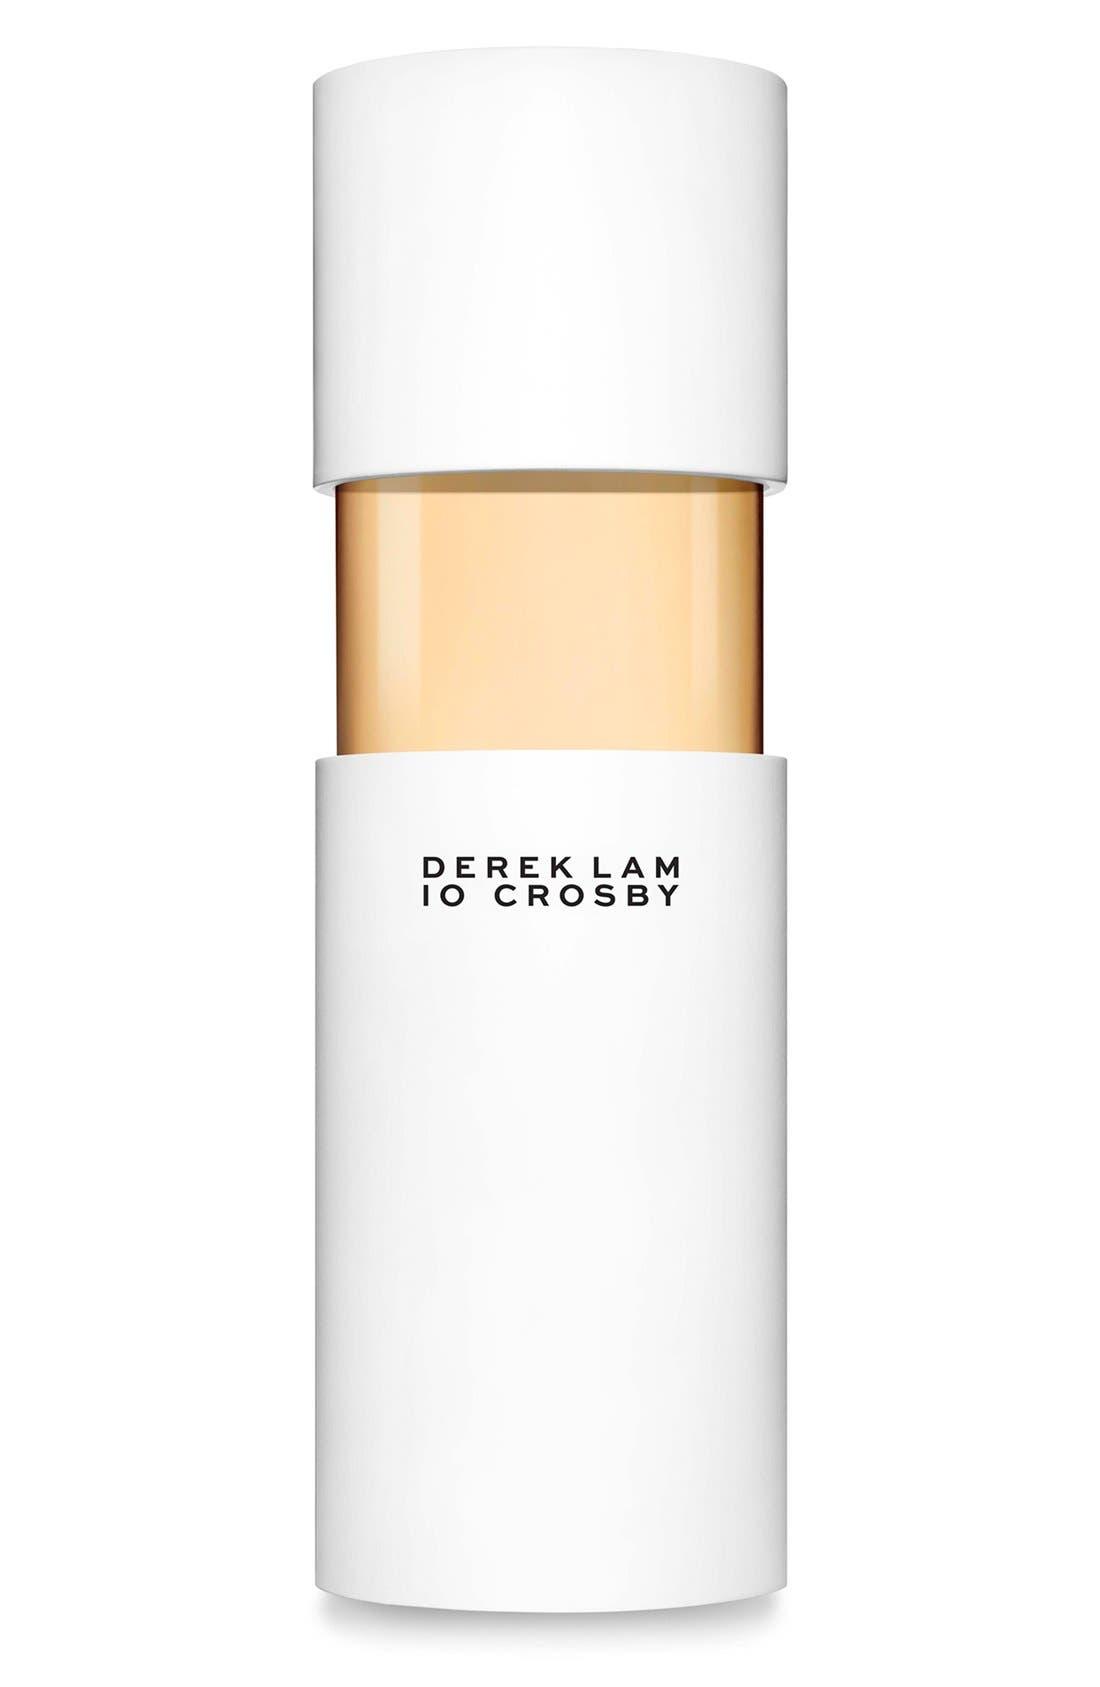 Derek Lam 10 Crosby 'Afloat' Eau de Parfum